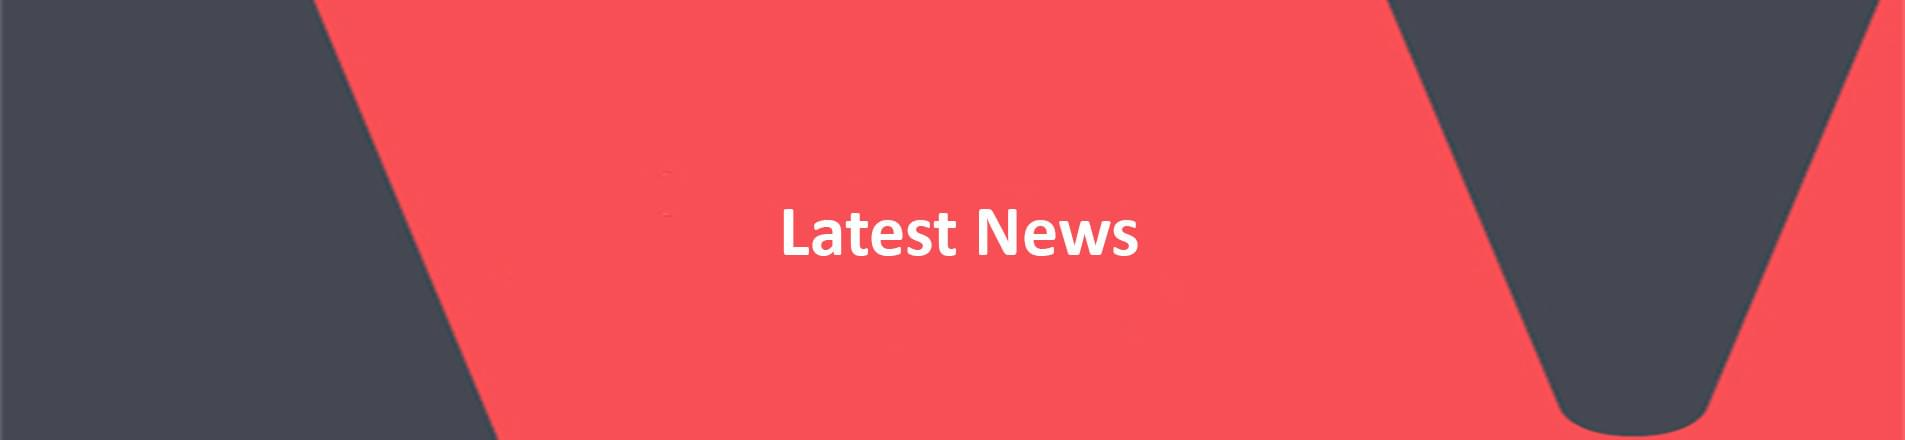 Latest News on red VERCIDA background